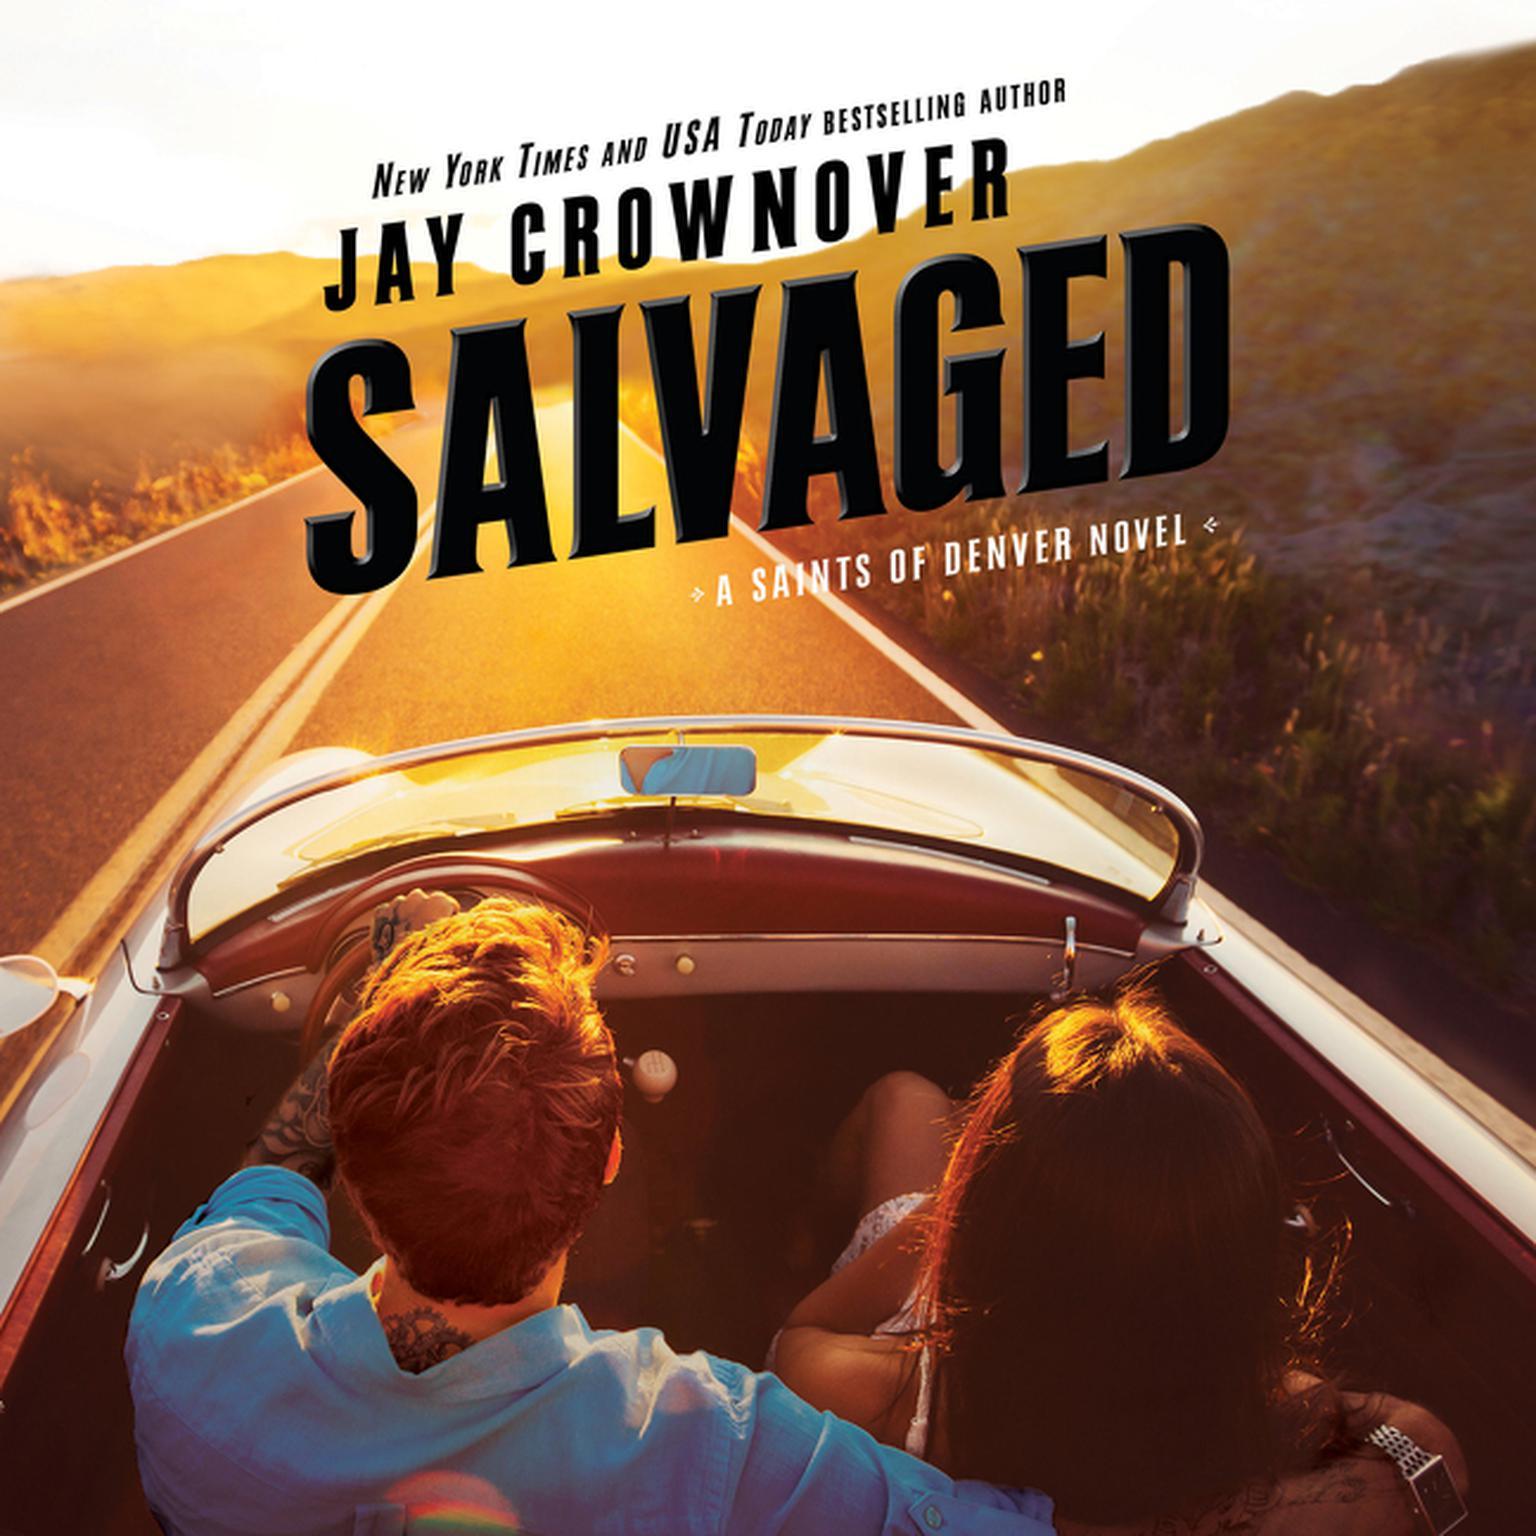 Salvaged: A Saints of Denver Novel Audiobook, by Jay Crownover